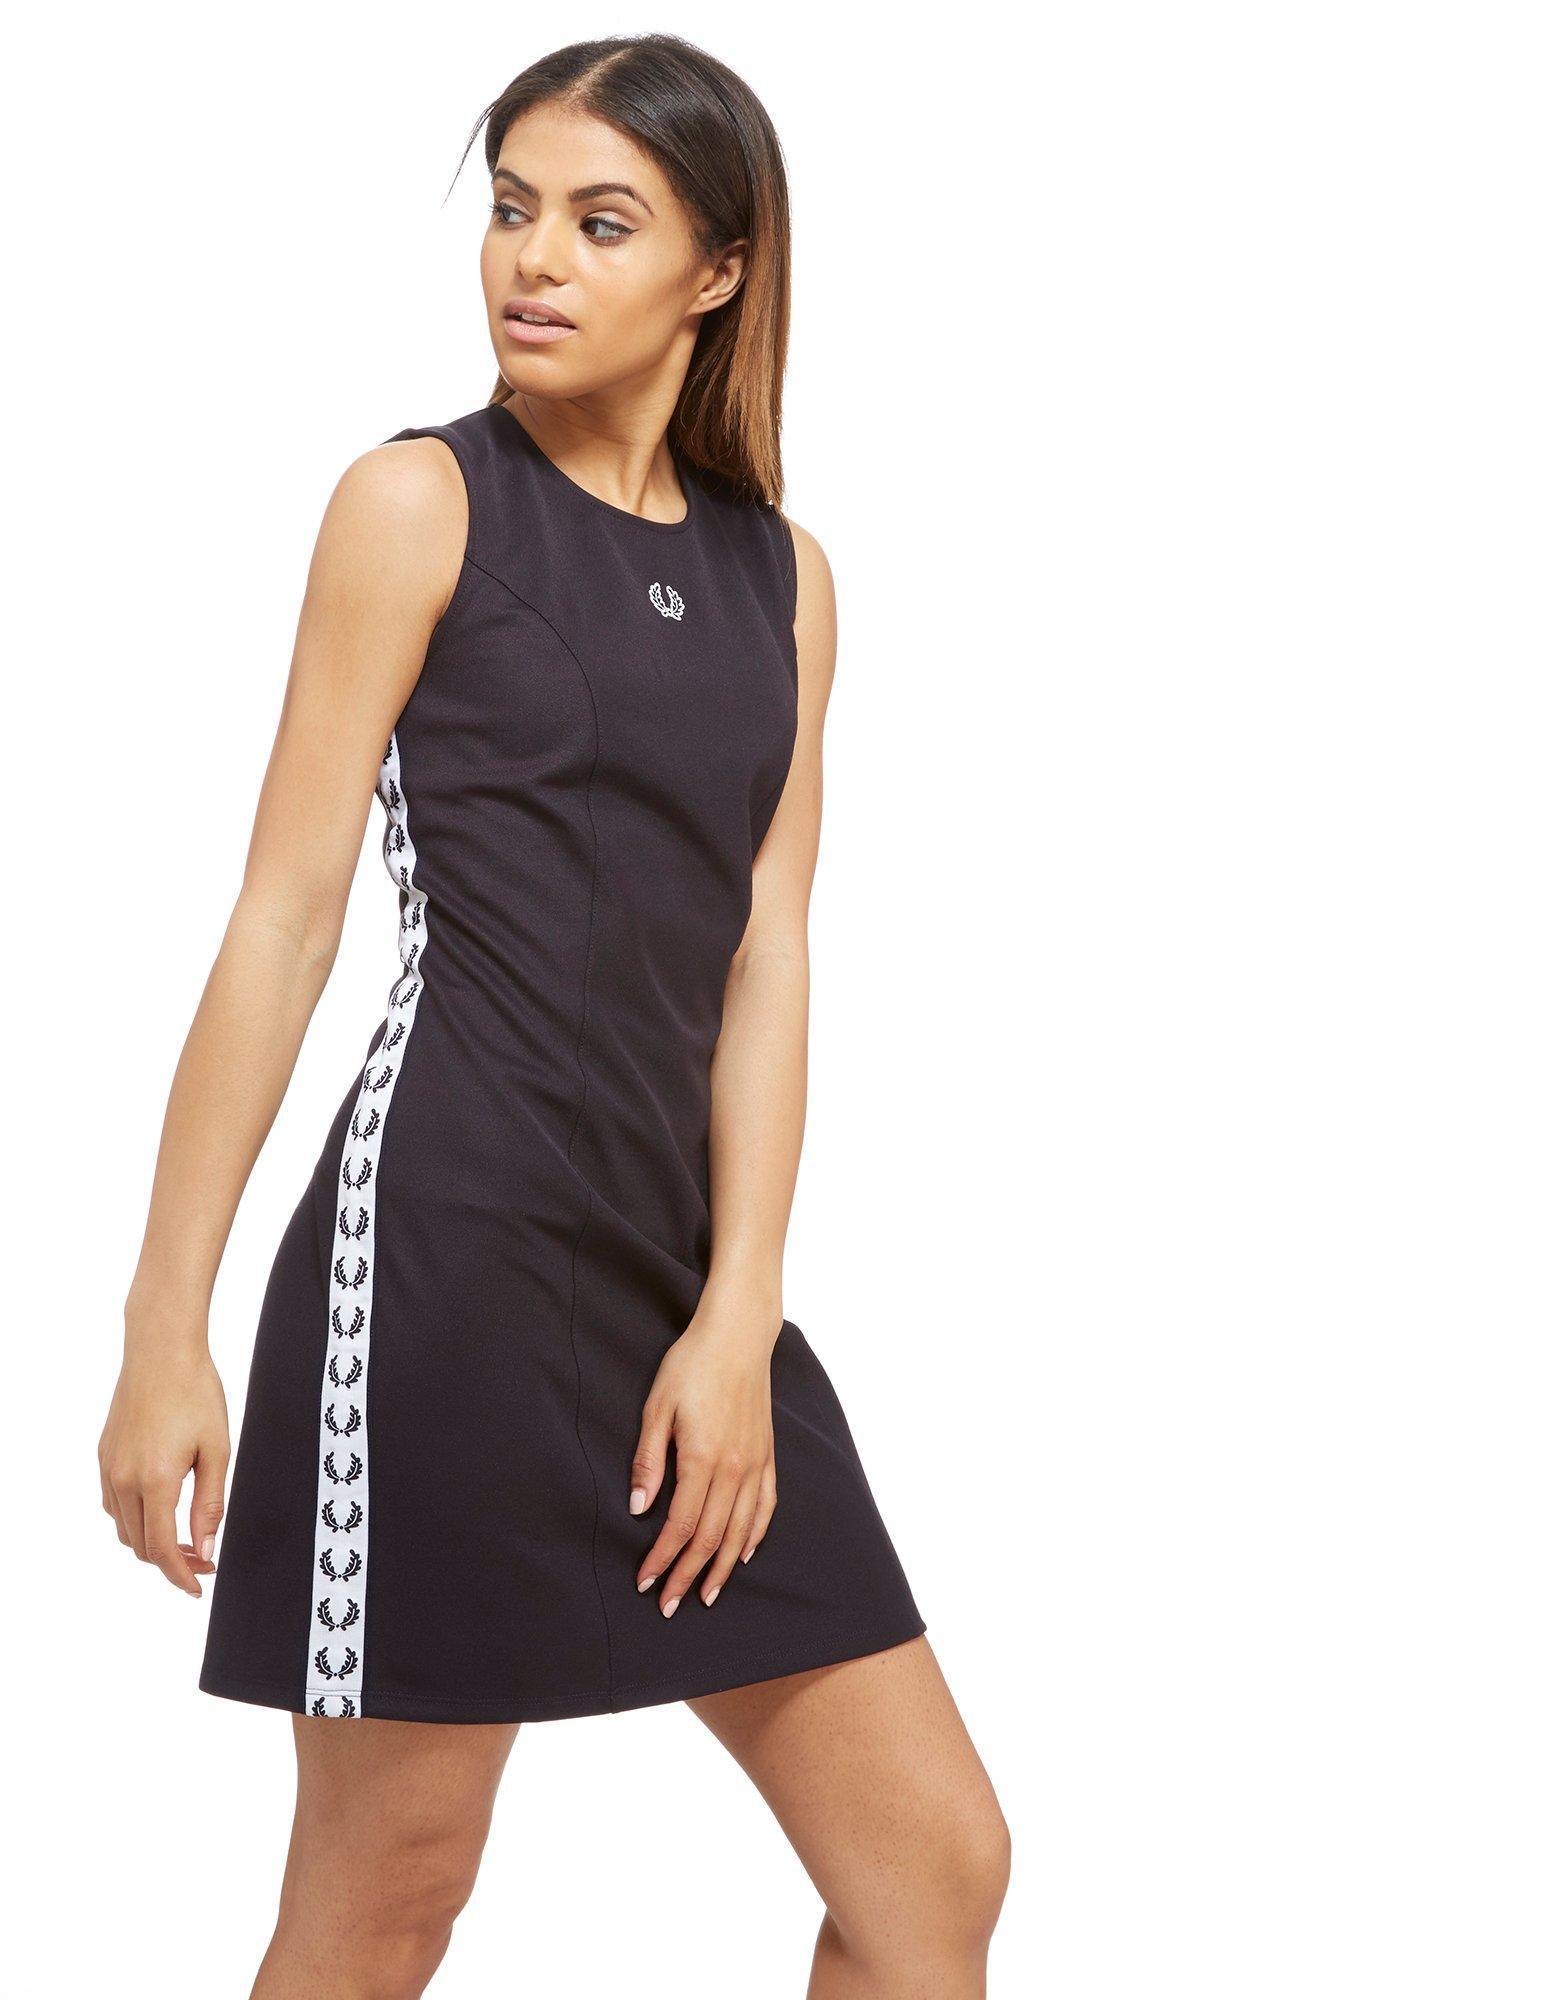 Clothing Fashion Tape